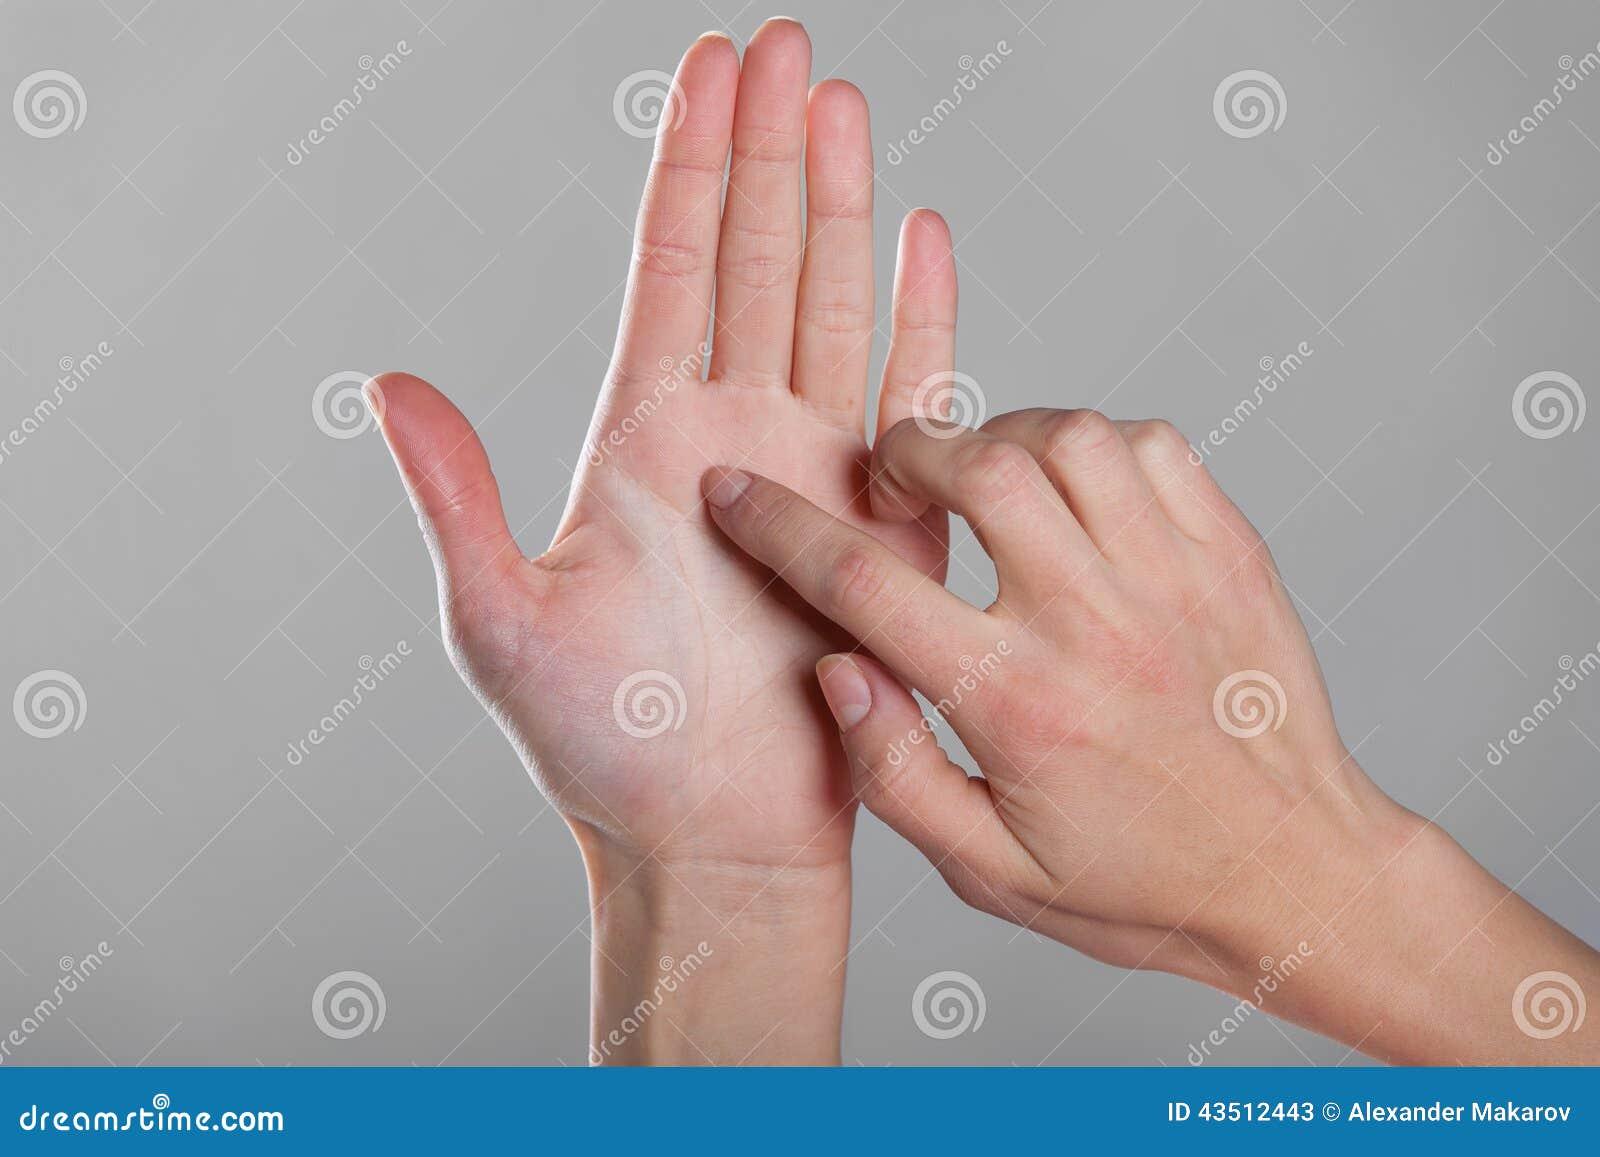 lesbian-female-fingering-pics-and-boys-mms